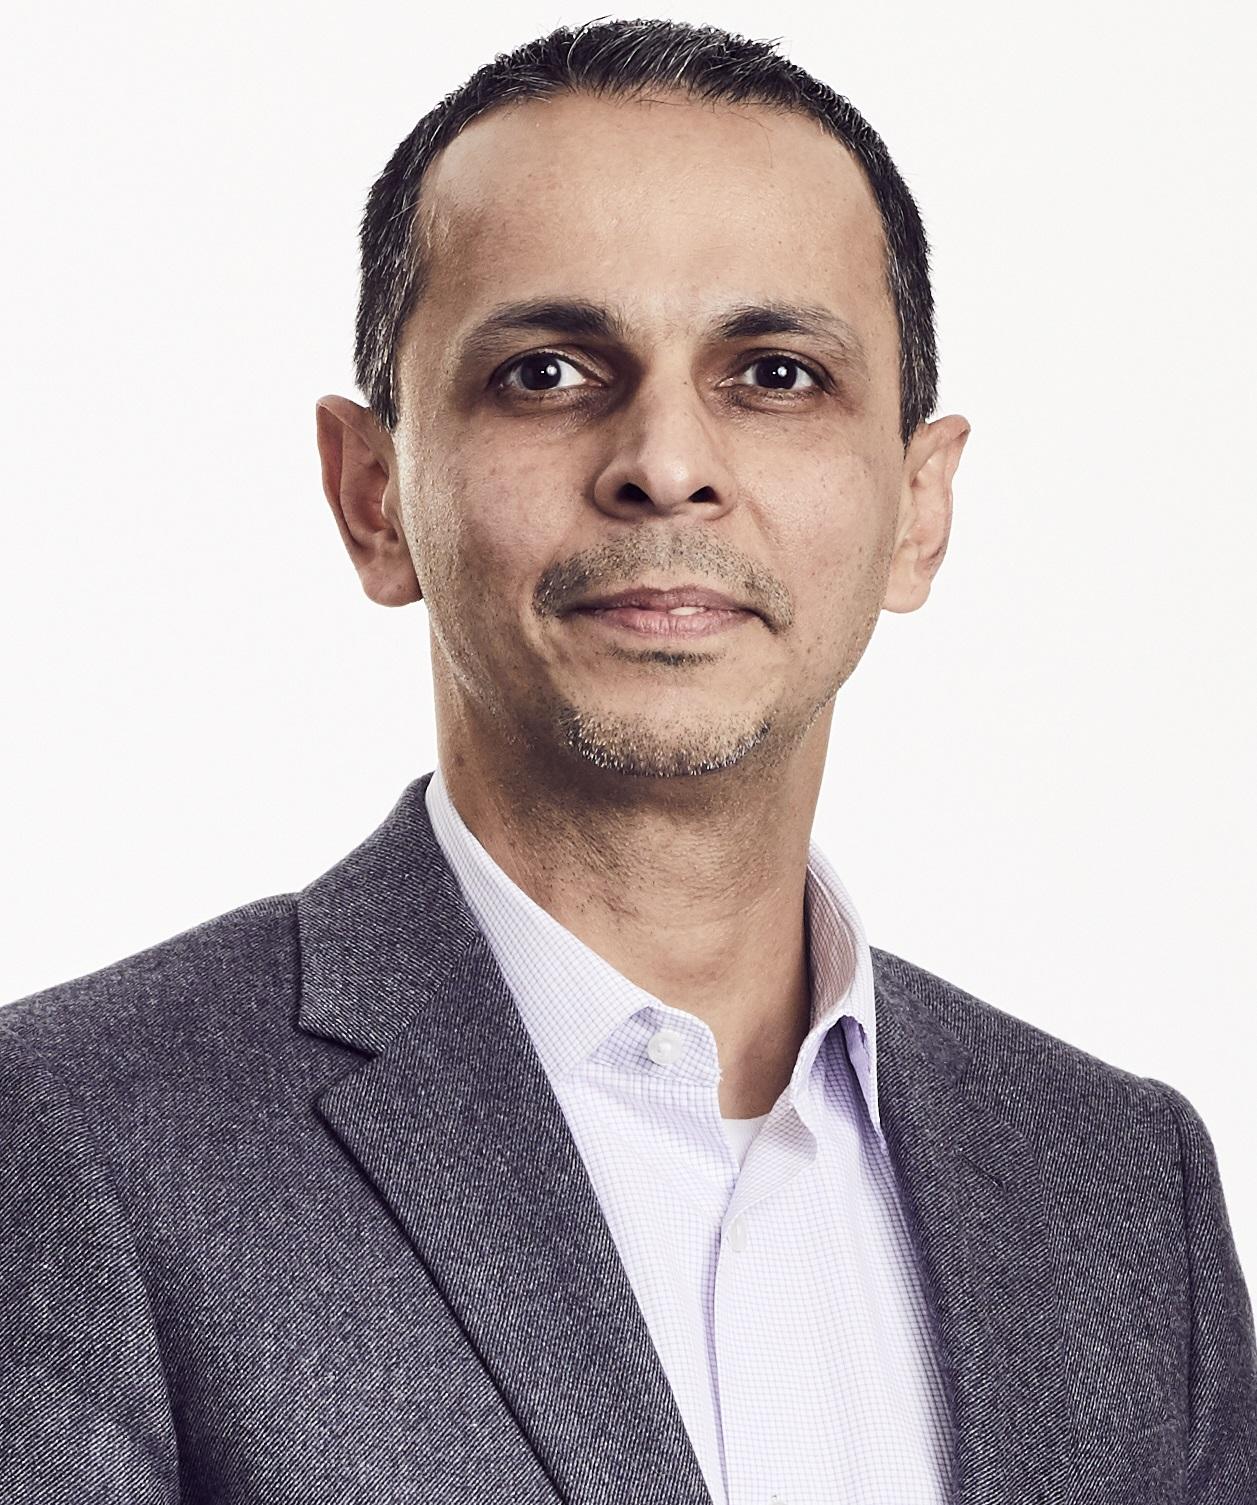 Hasnain Versi - President & CEO, ISM Canada